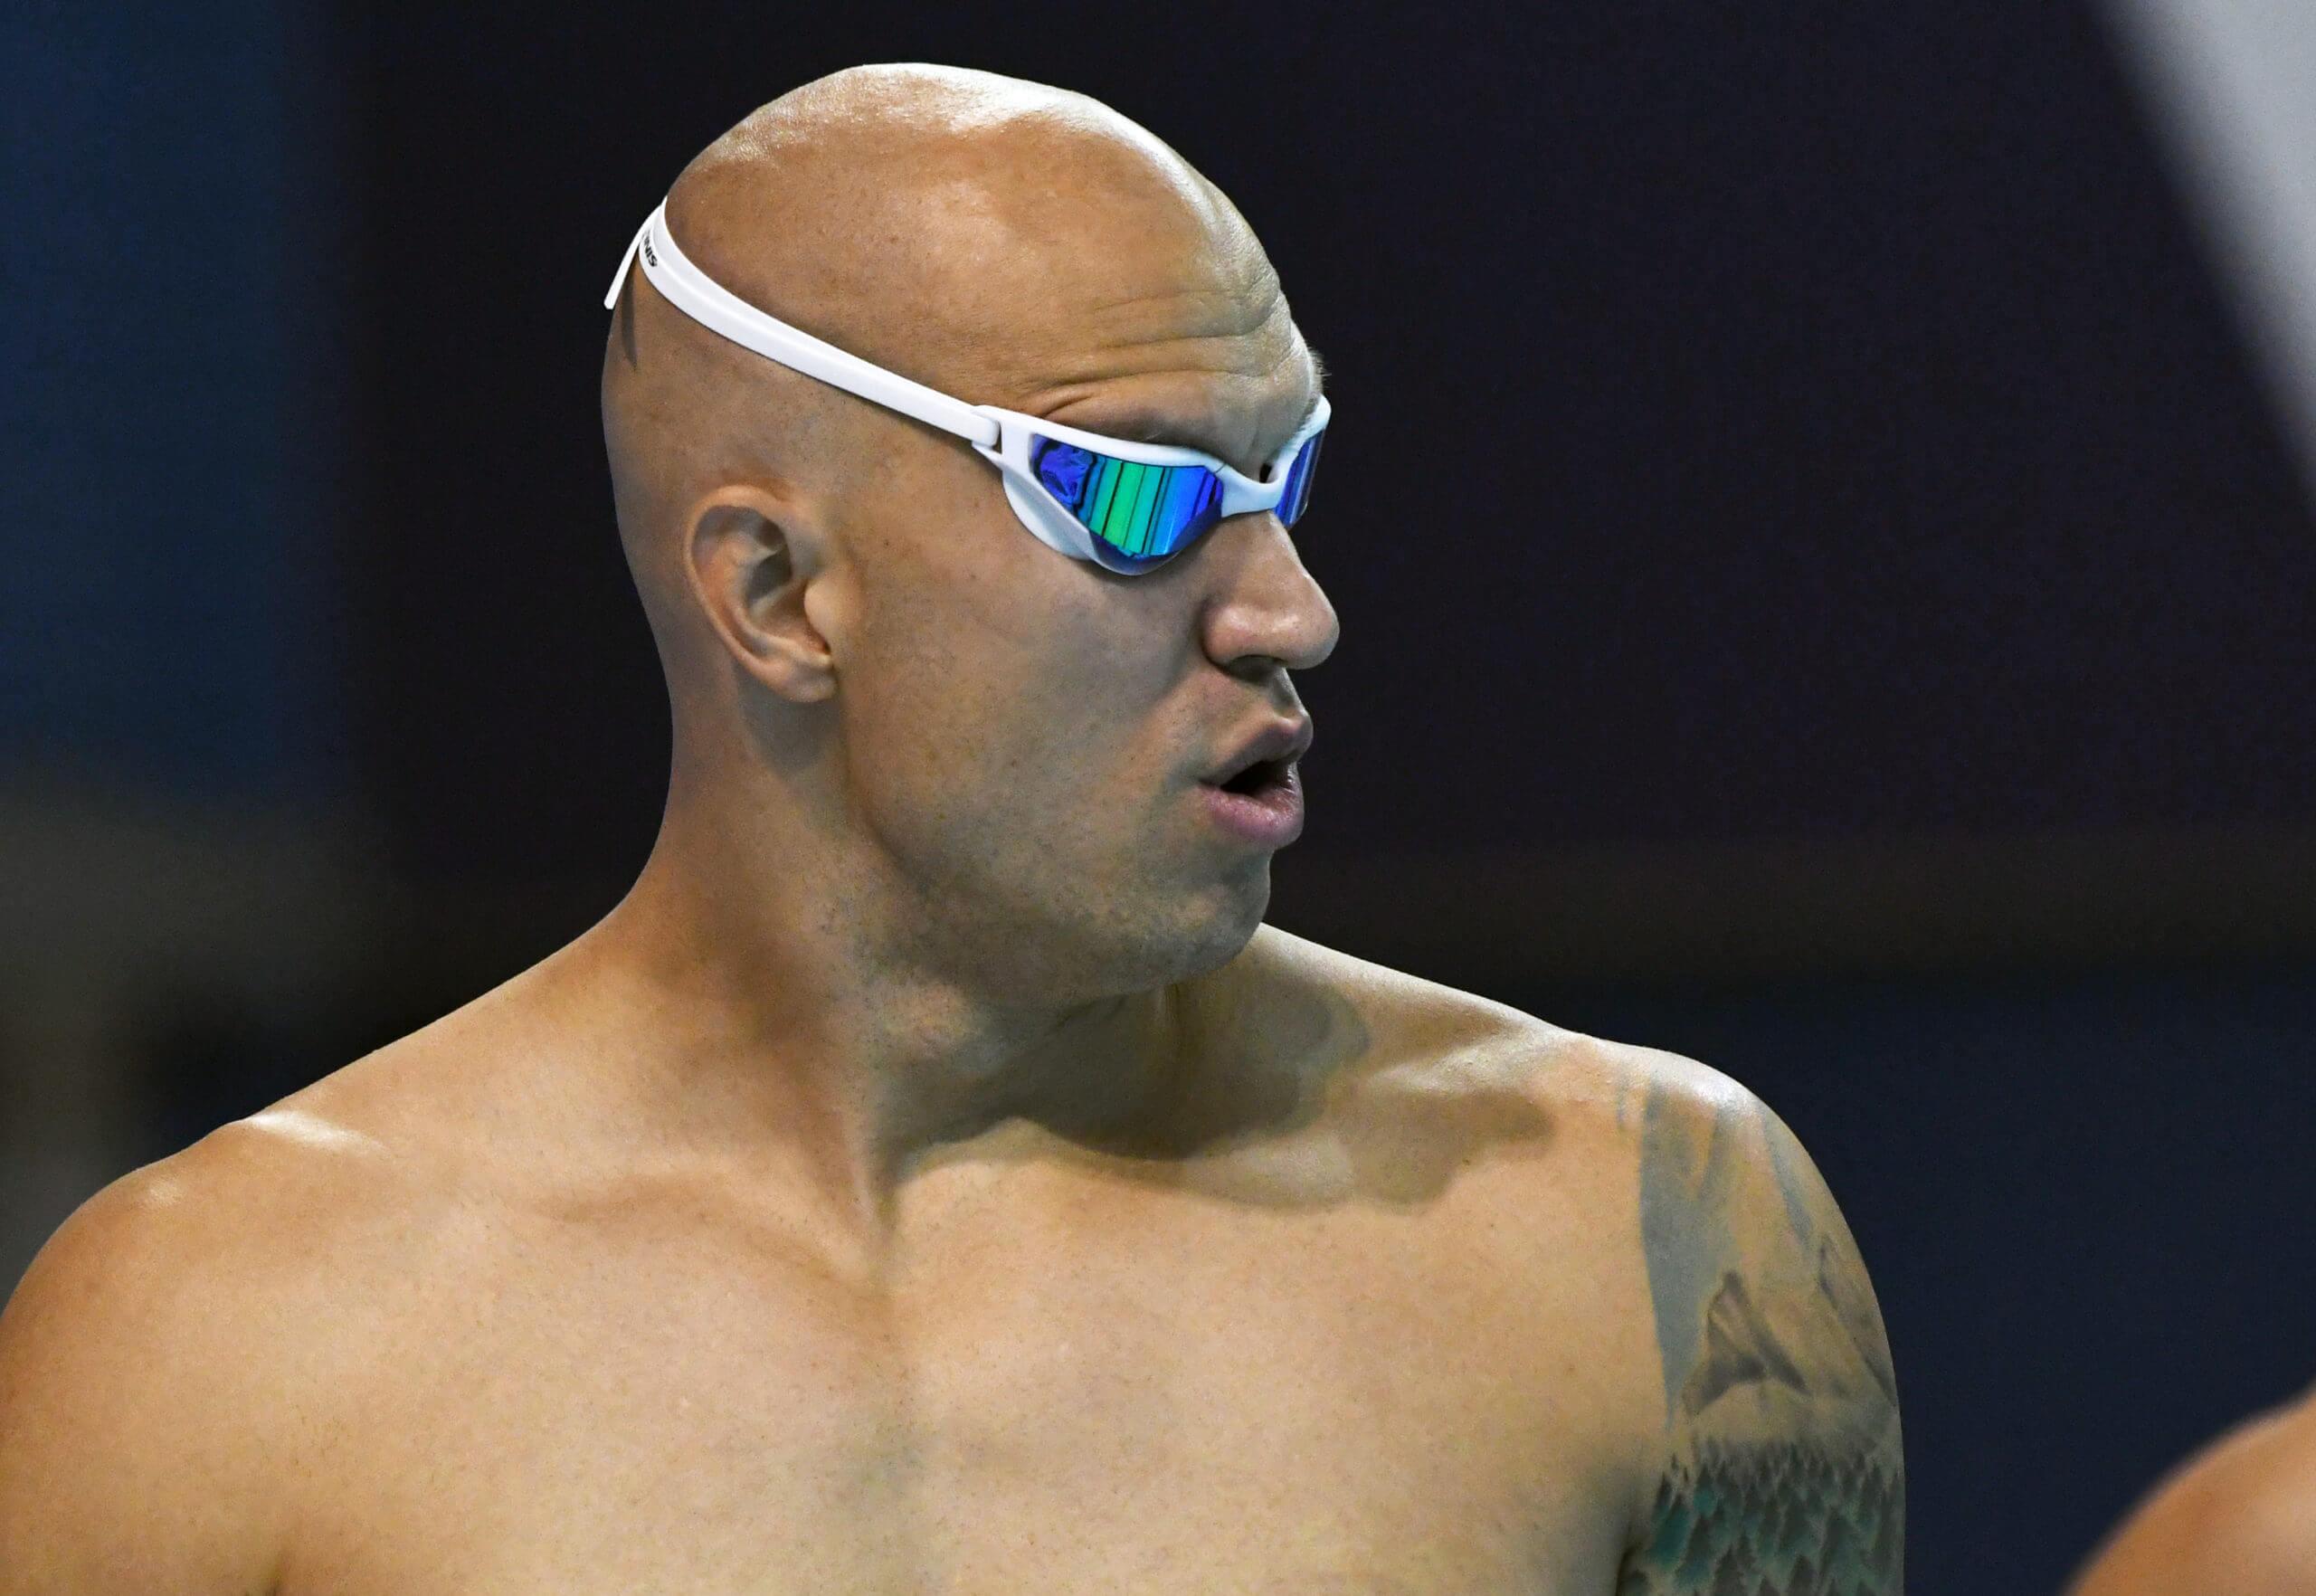 Brent Hayden-Olympic Swimming Trials-h-21june2021Photo Scott Grant